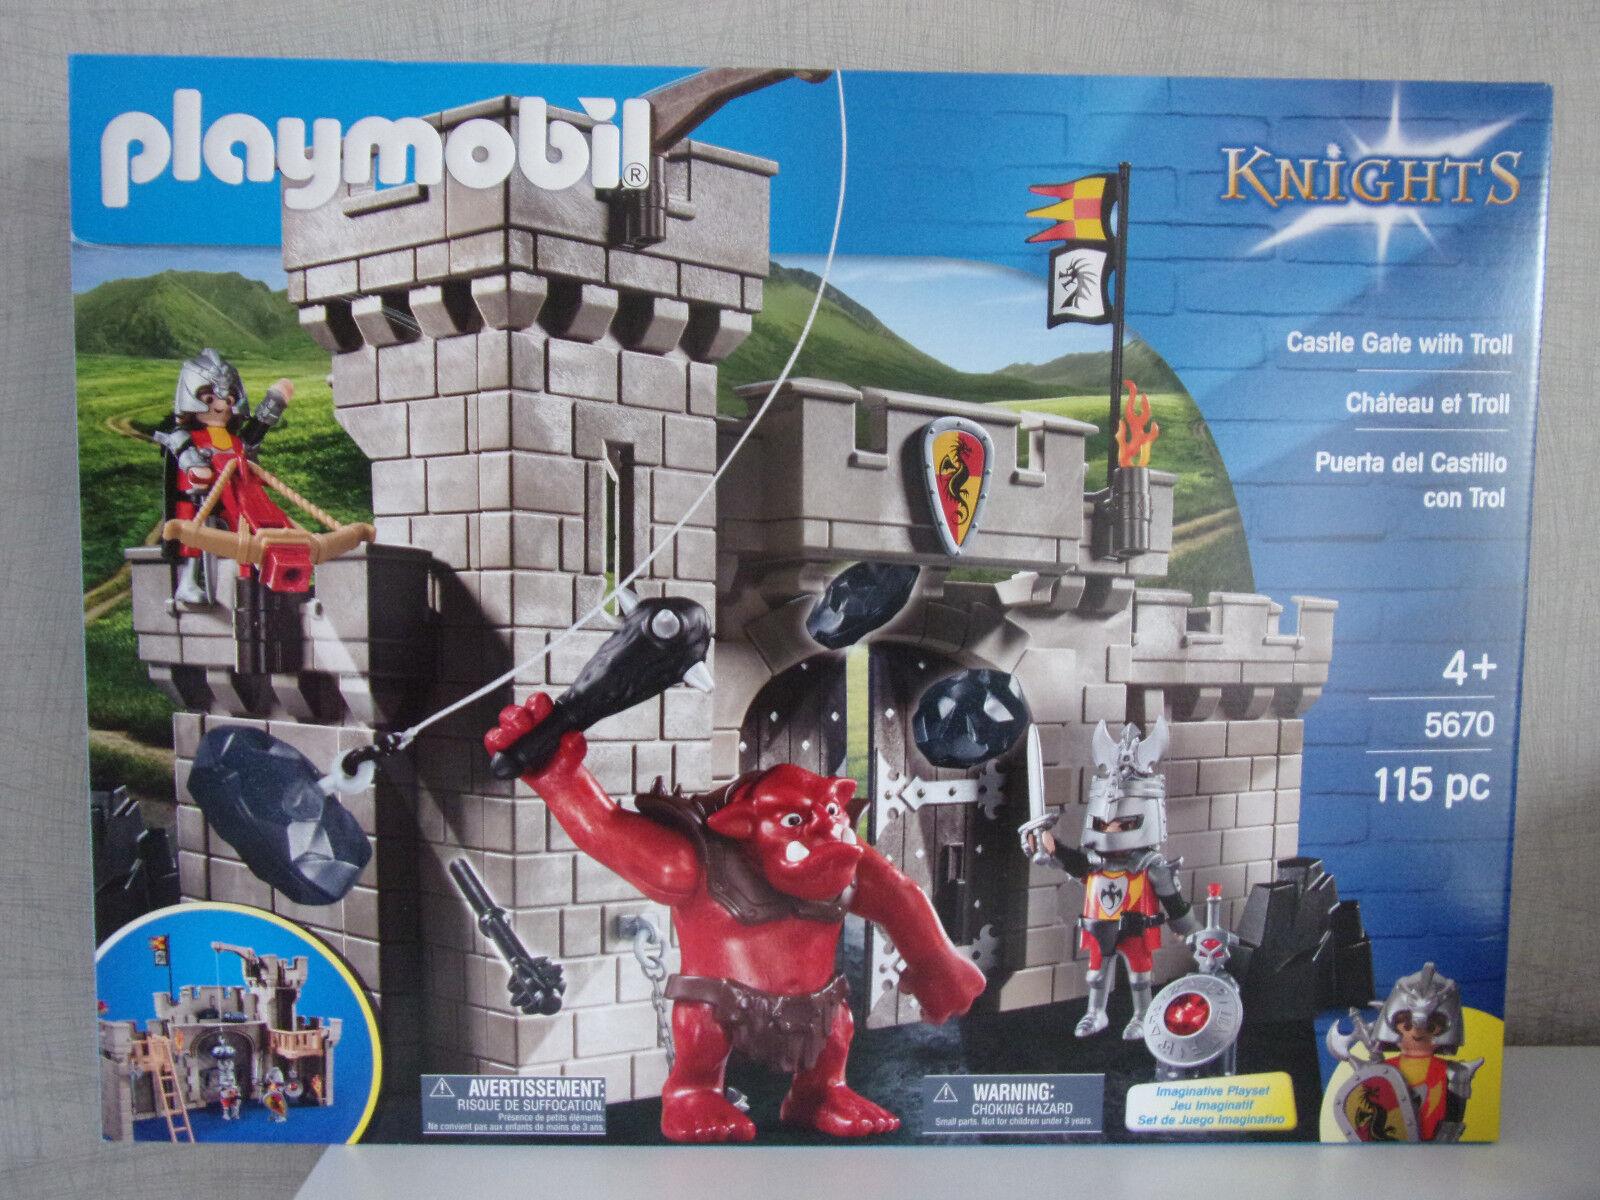 PLAYMOBIL KNIGHTS 5670 Burgtor avec troll ( Château GATE + Troll) -